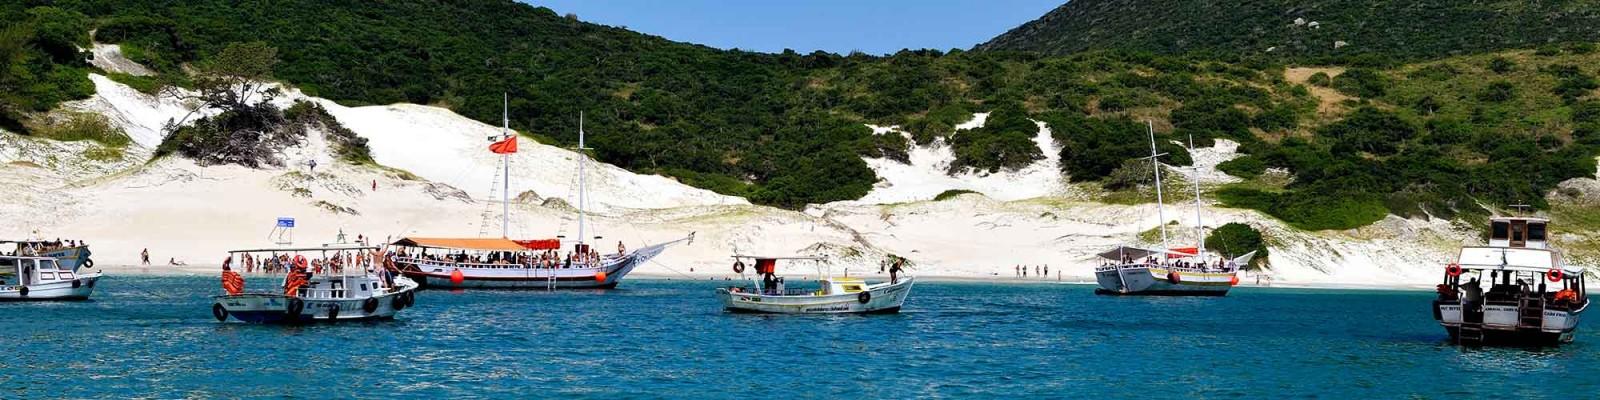 Tenrag Yacht Charter: Brazil